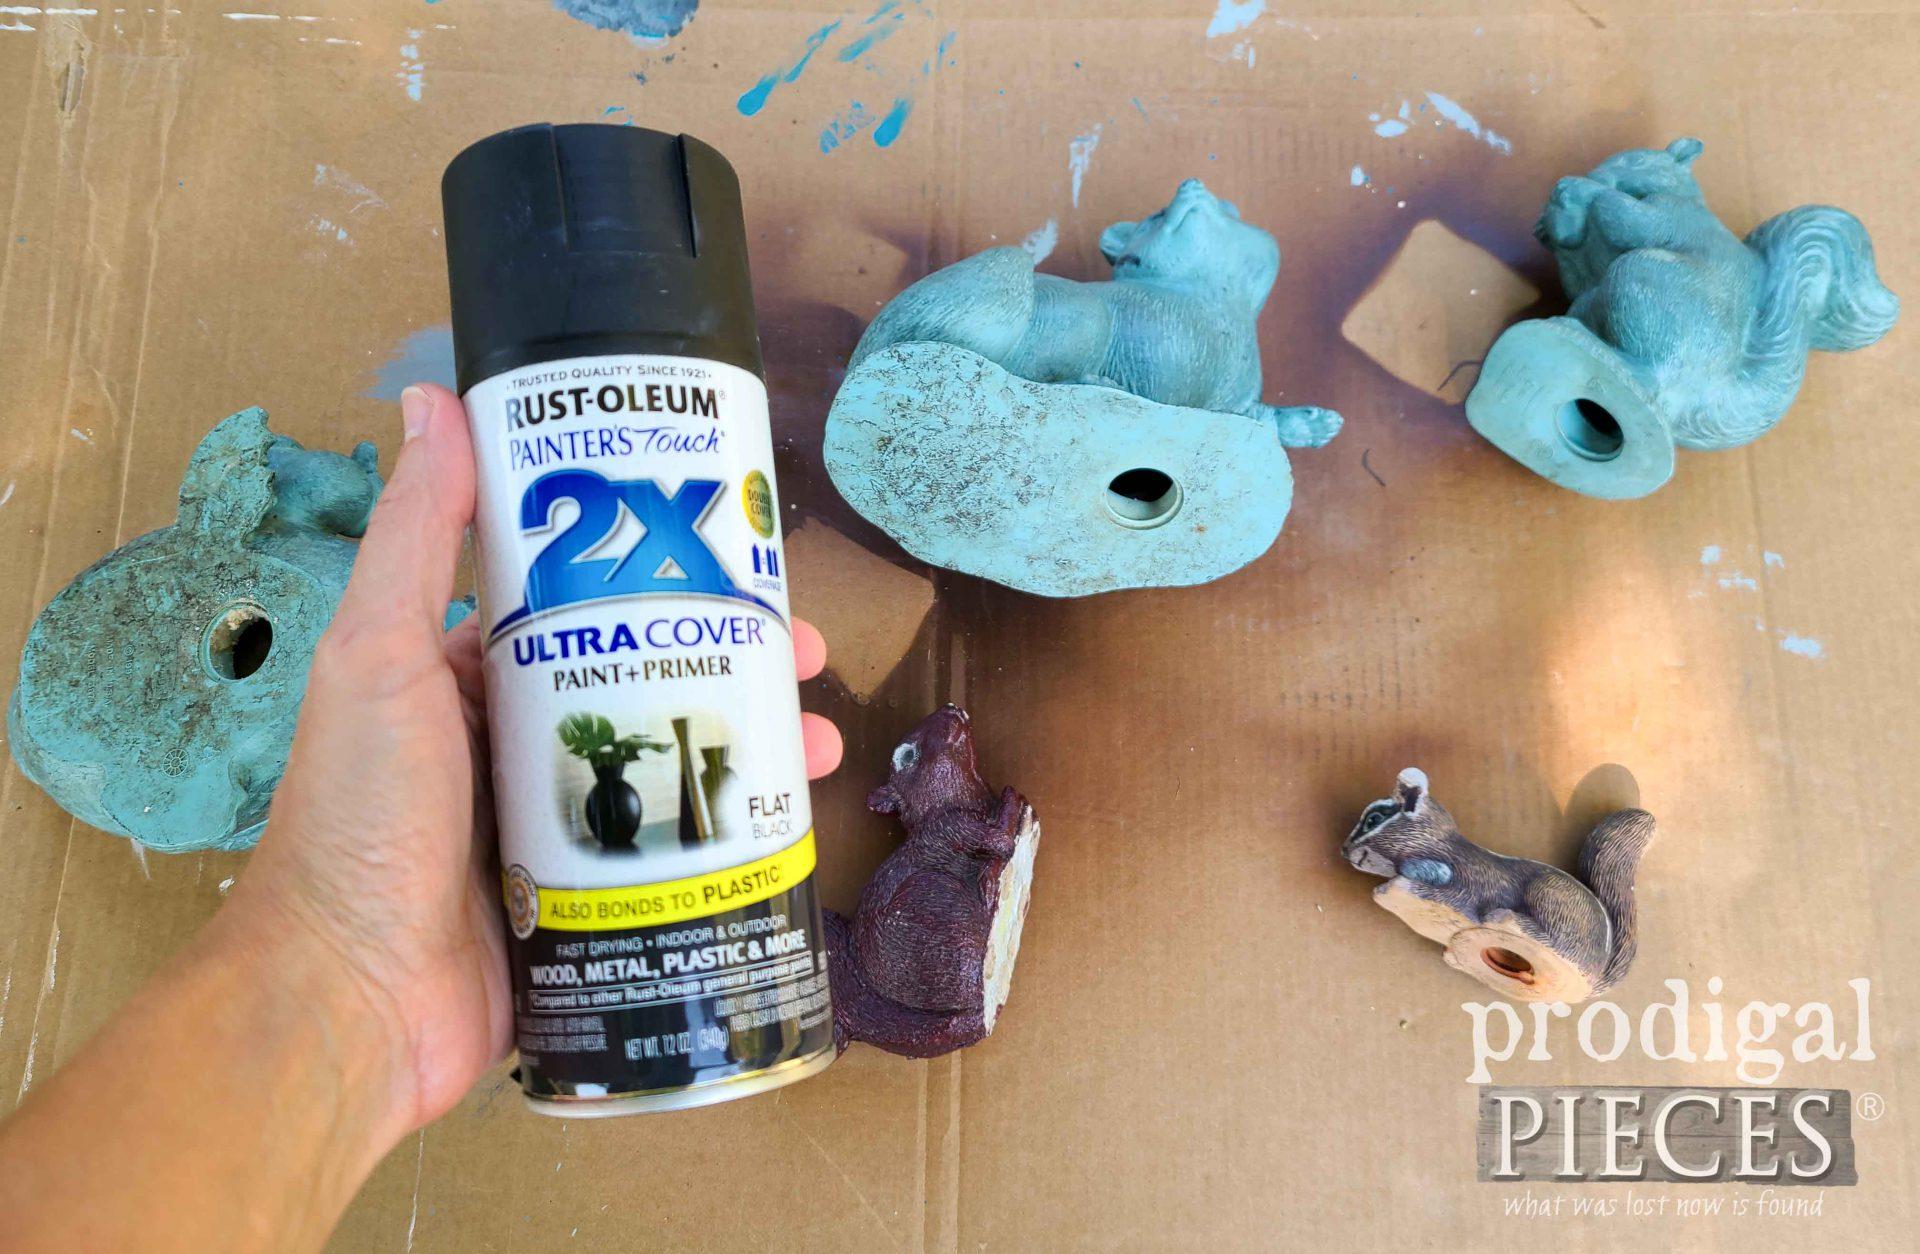 Spray Painting Upcycled Doorstops | prodigalpieces.com